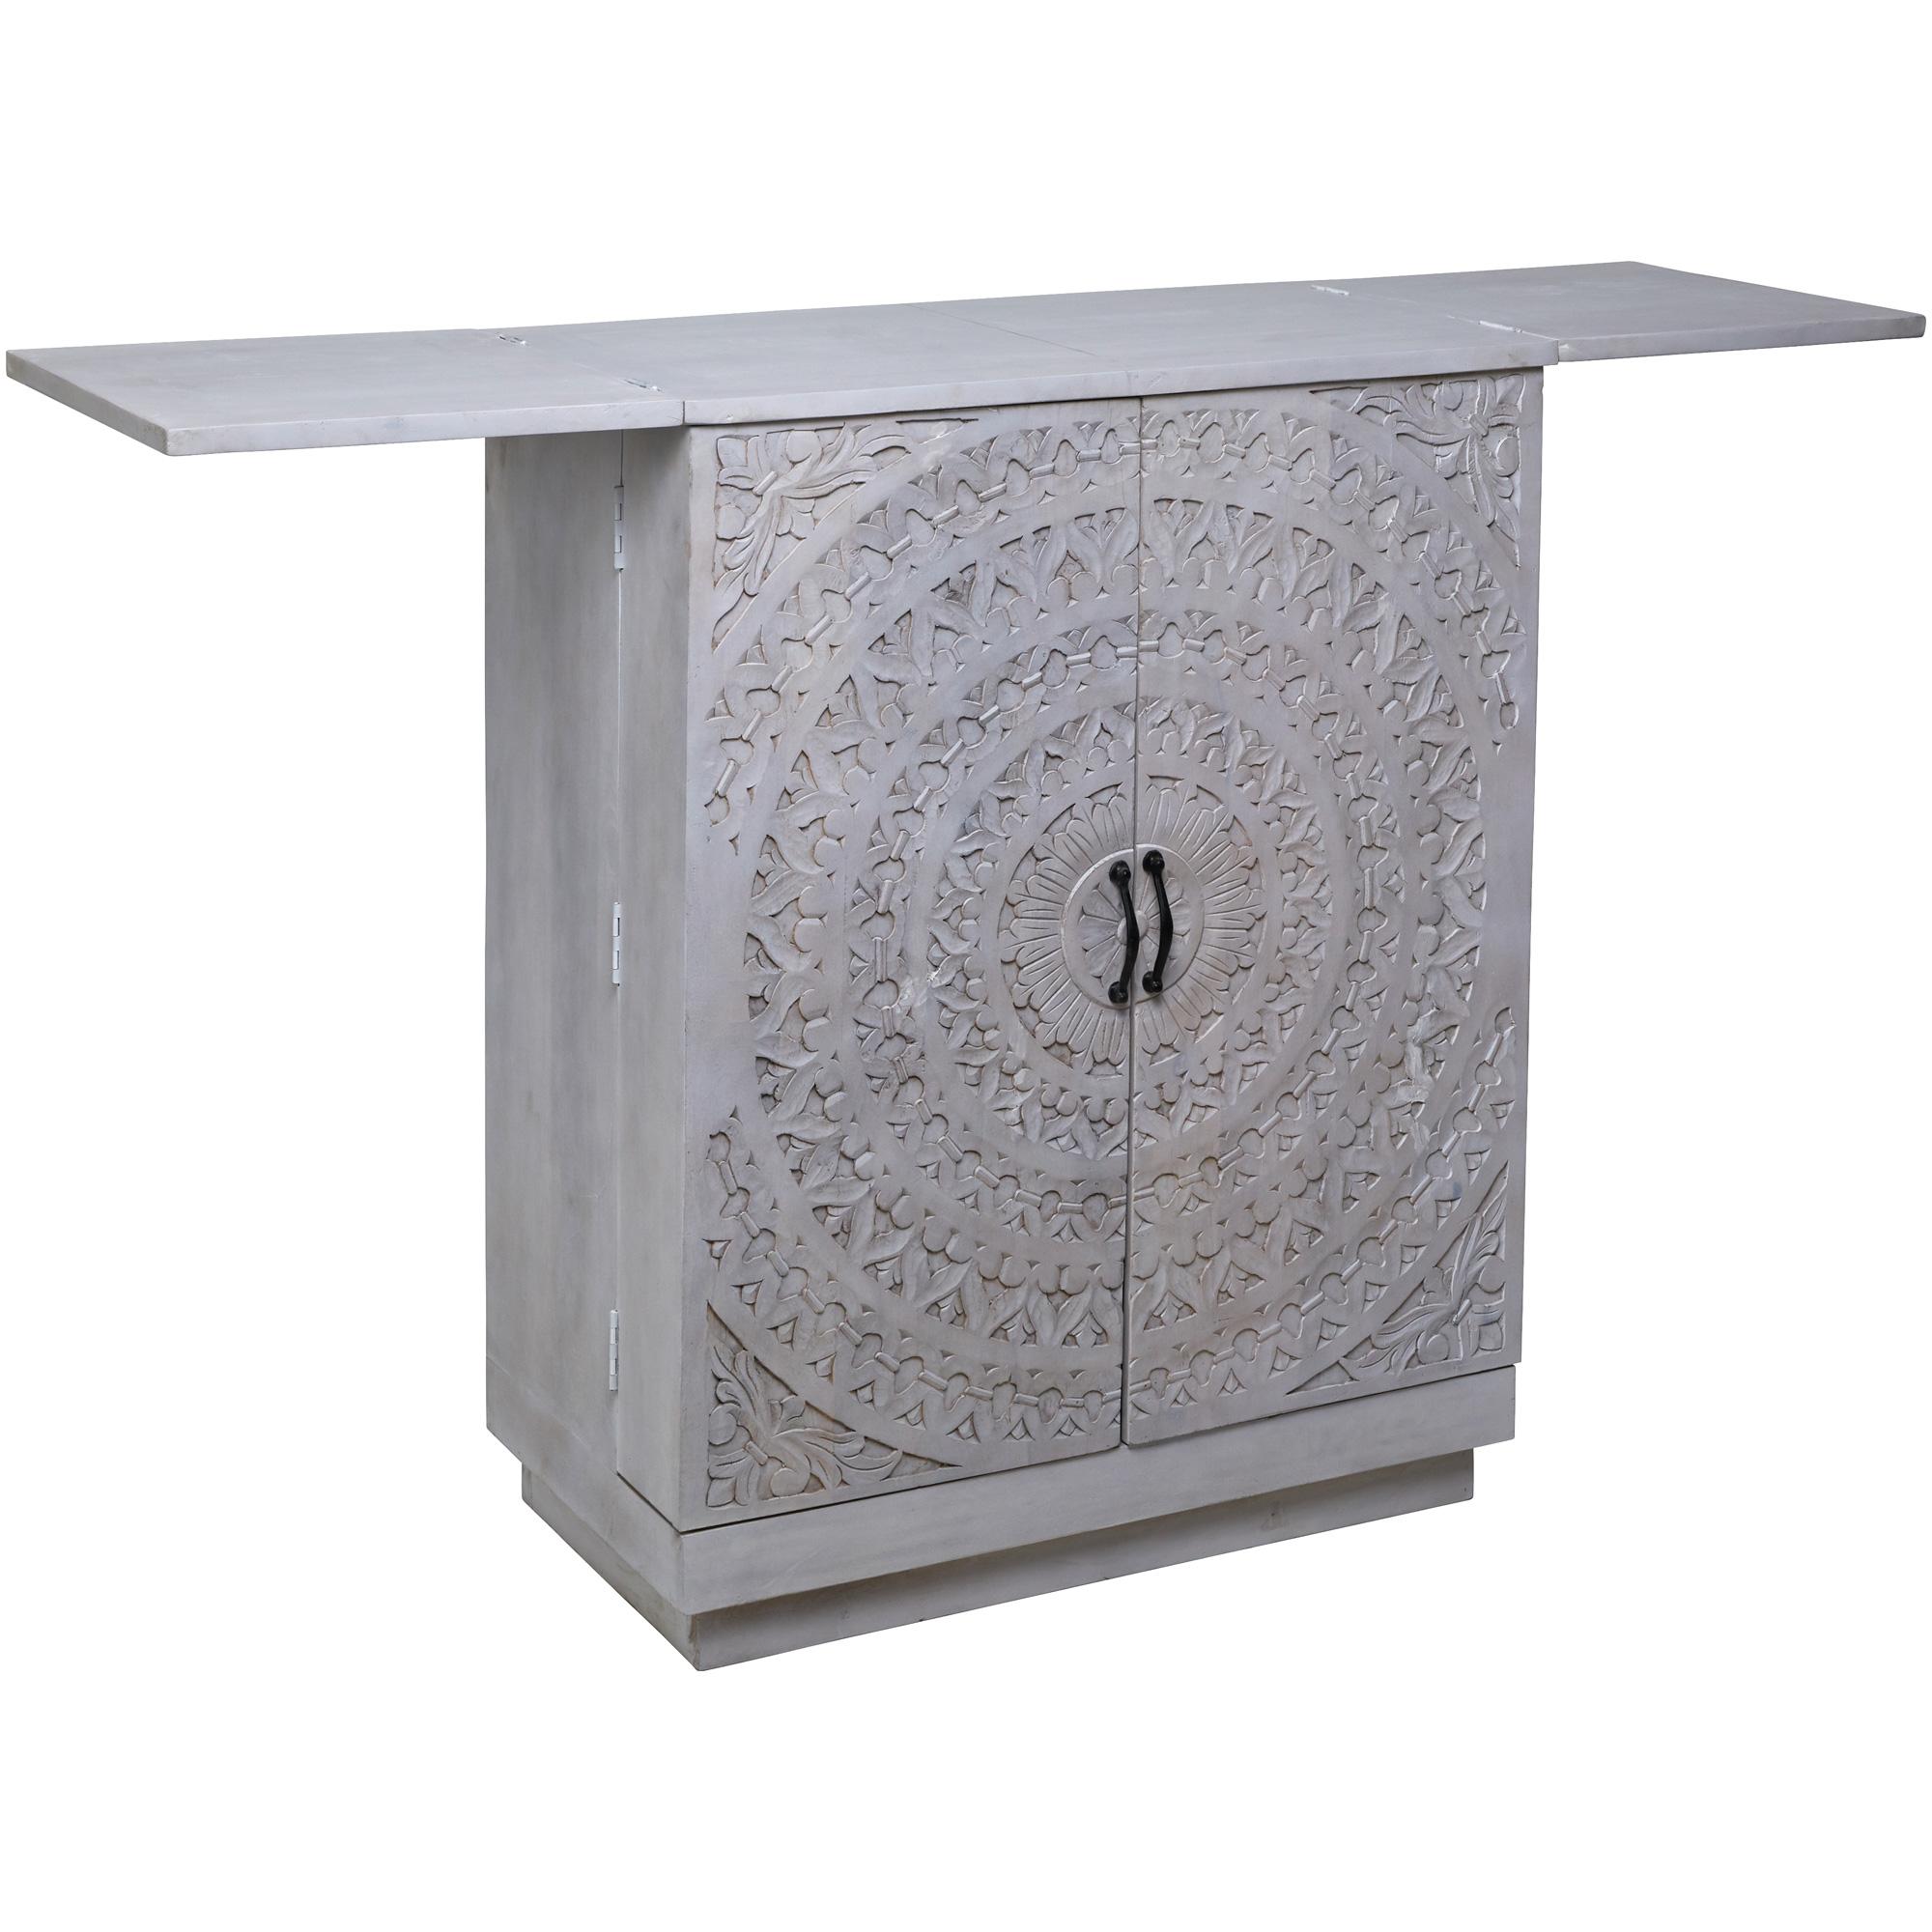 Jaipur Home LLC | Expressive Impressions White Cabinet